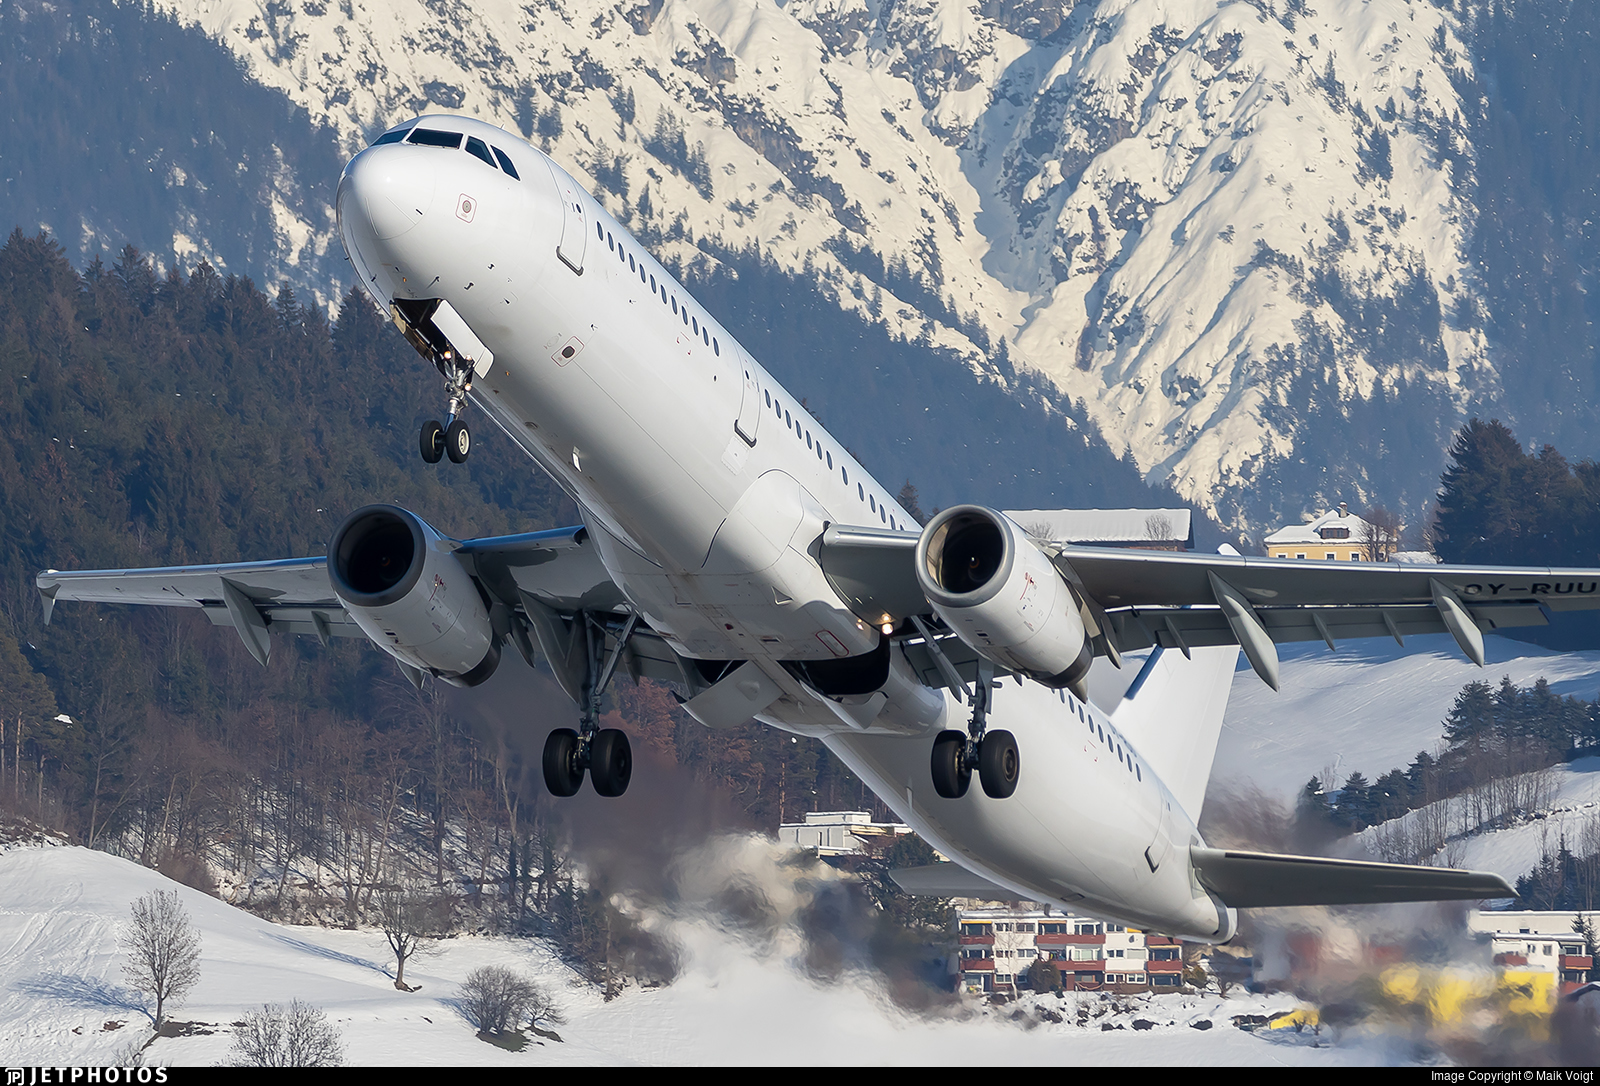 OY-RUU - Airbus A321-231 - Danish Air Transport (DAT)